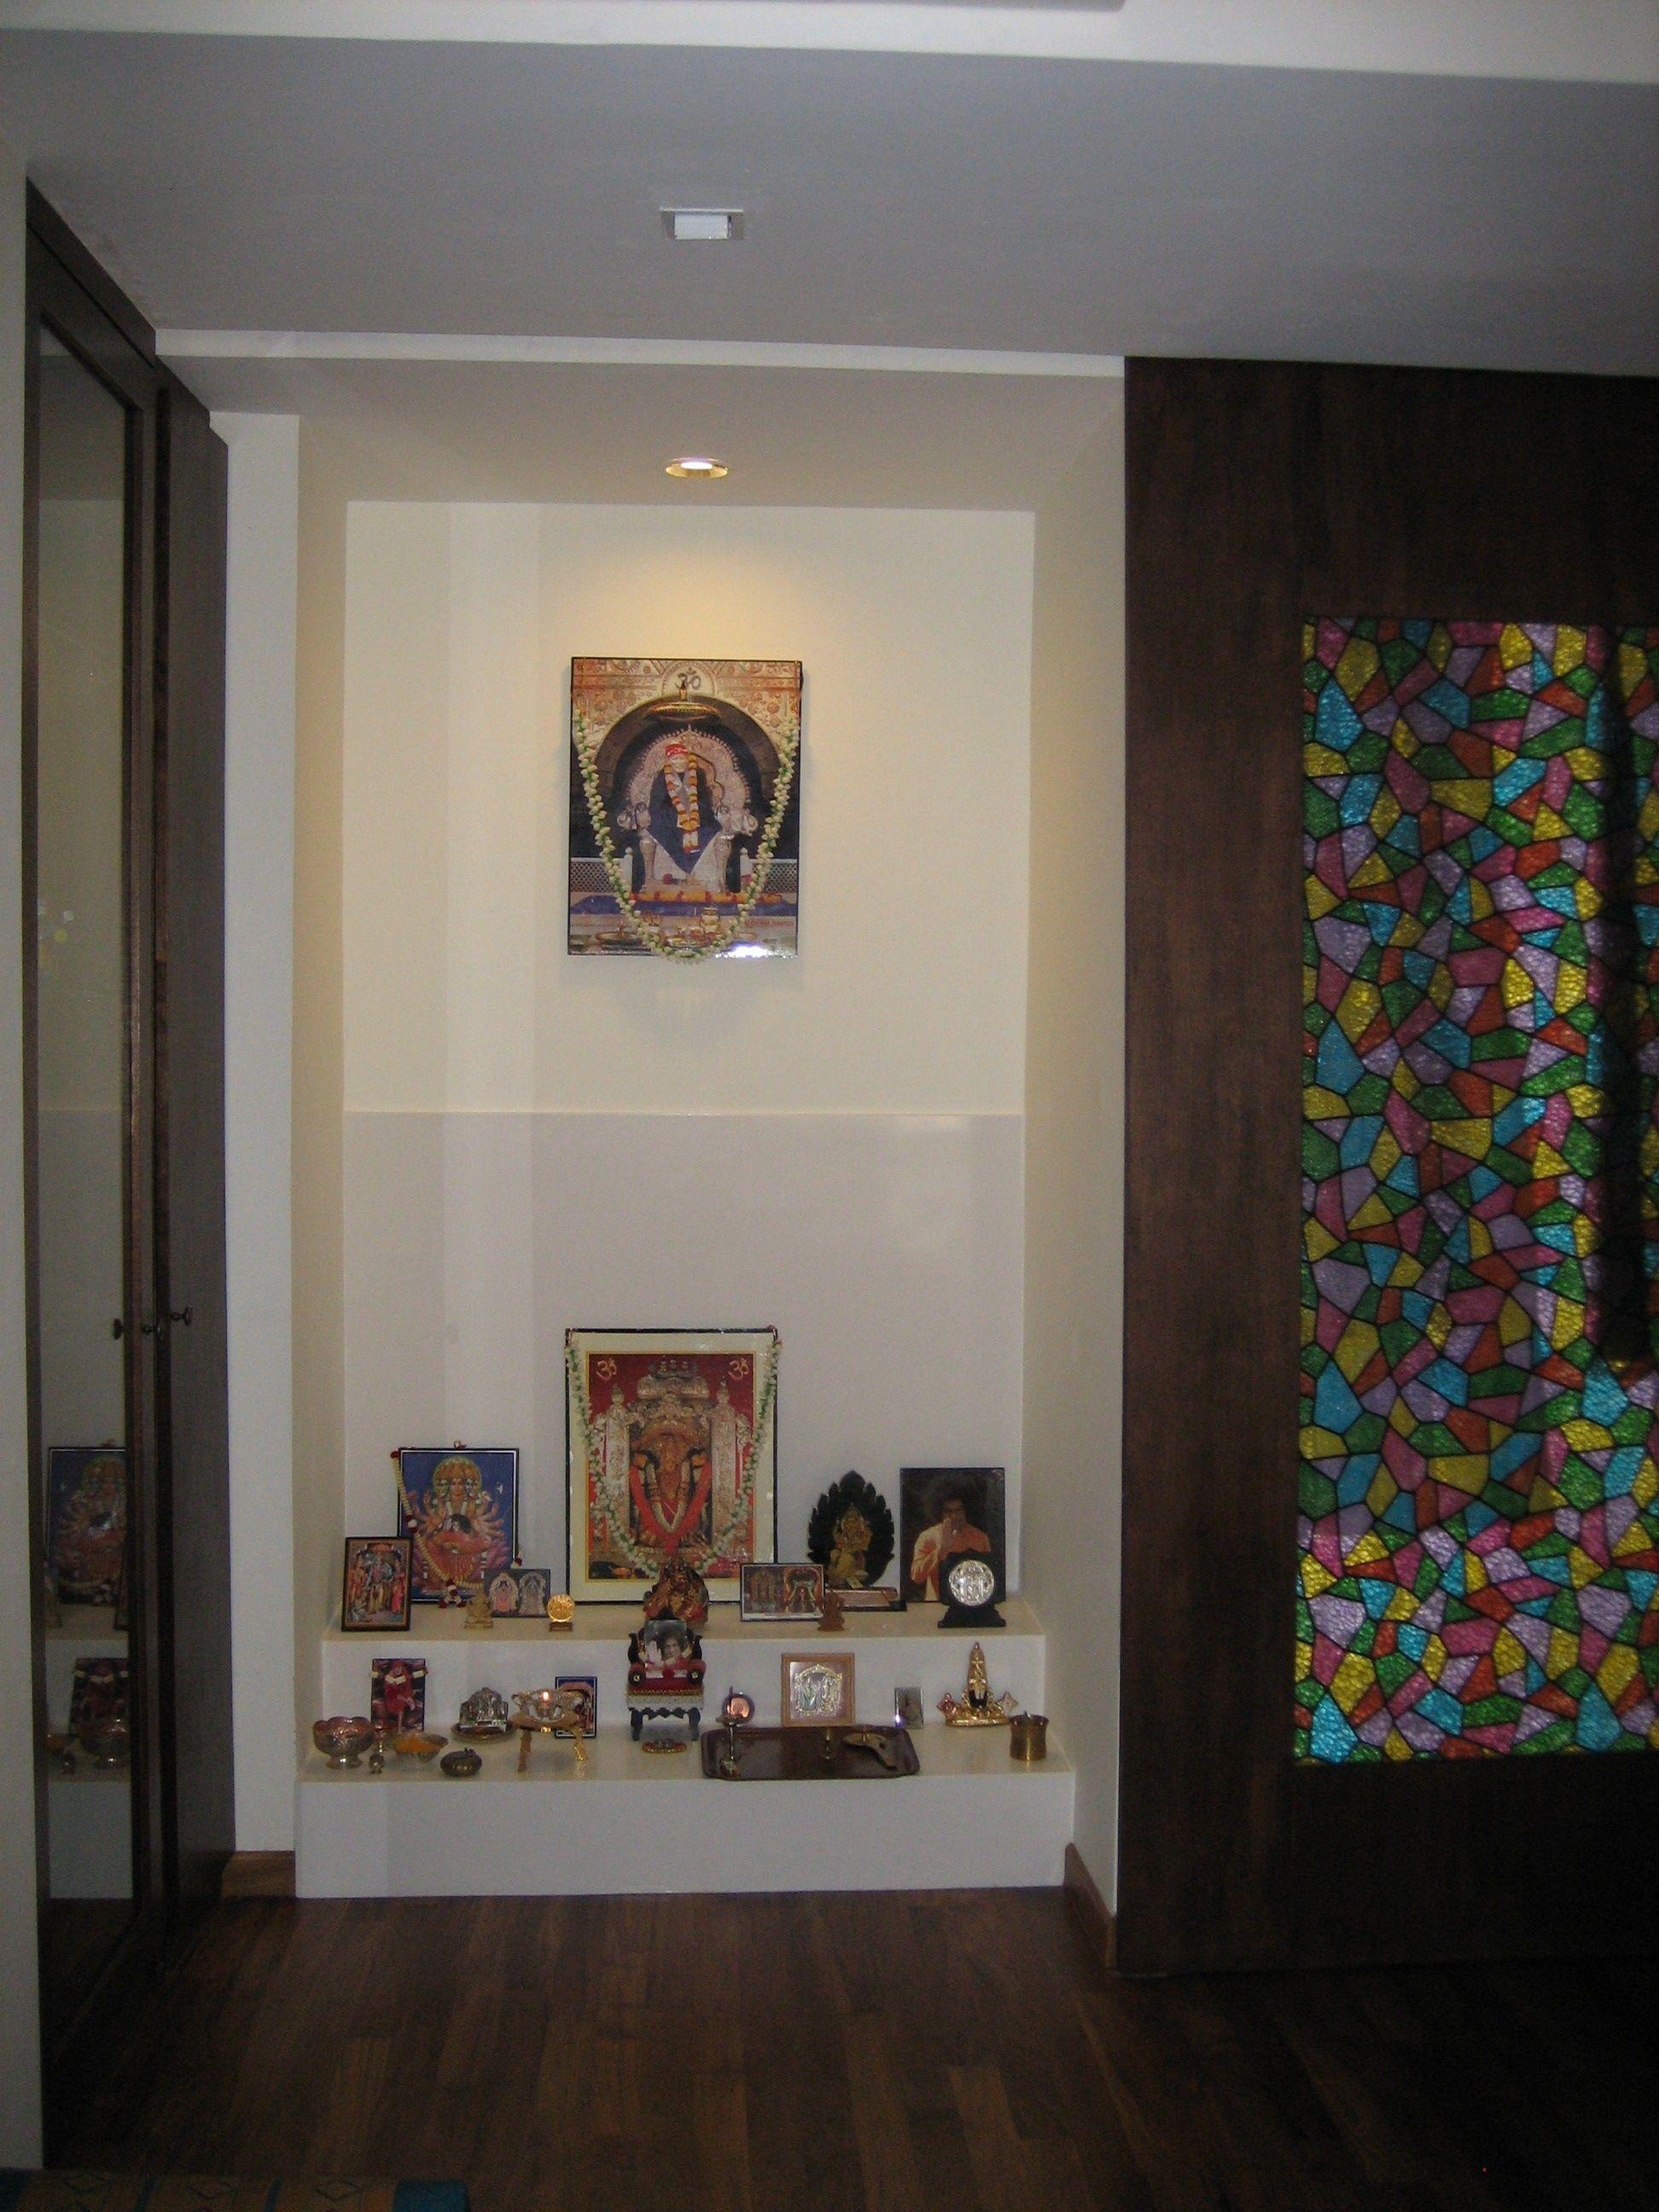 Lovely Puja Room Design. Home Mandir. Lamps. Doors. Vastu. Idols Placement.